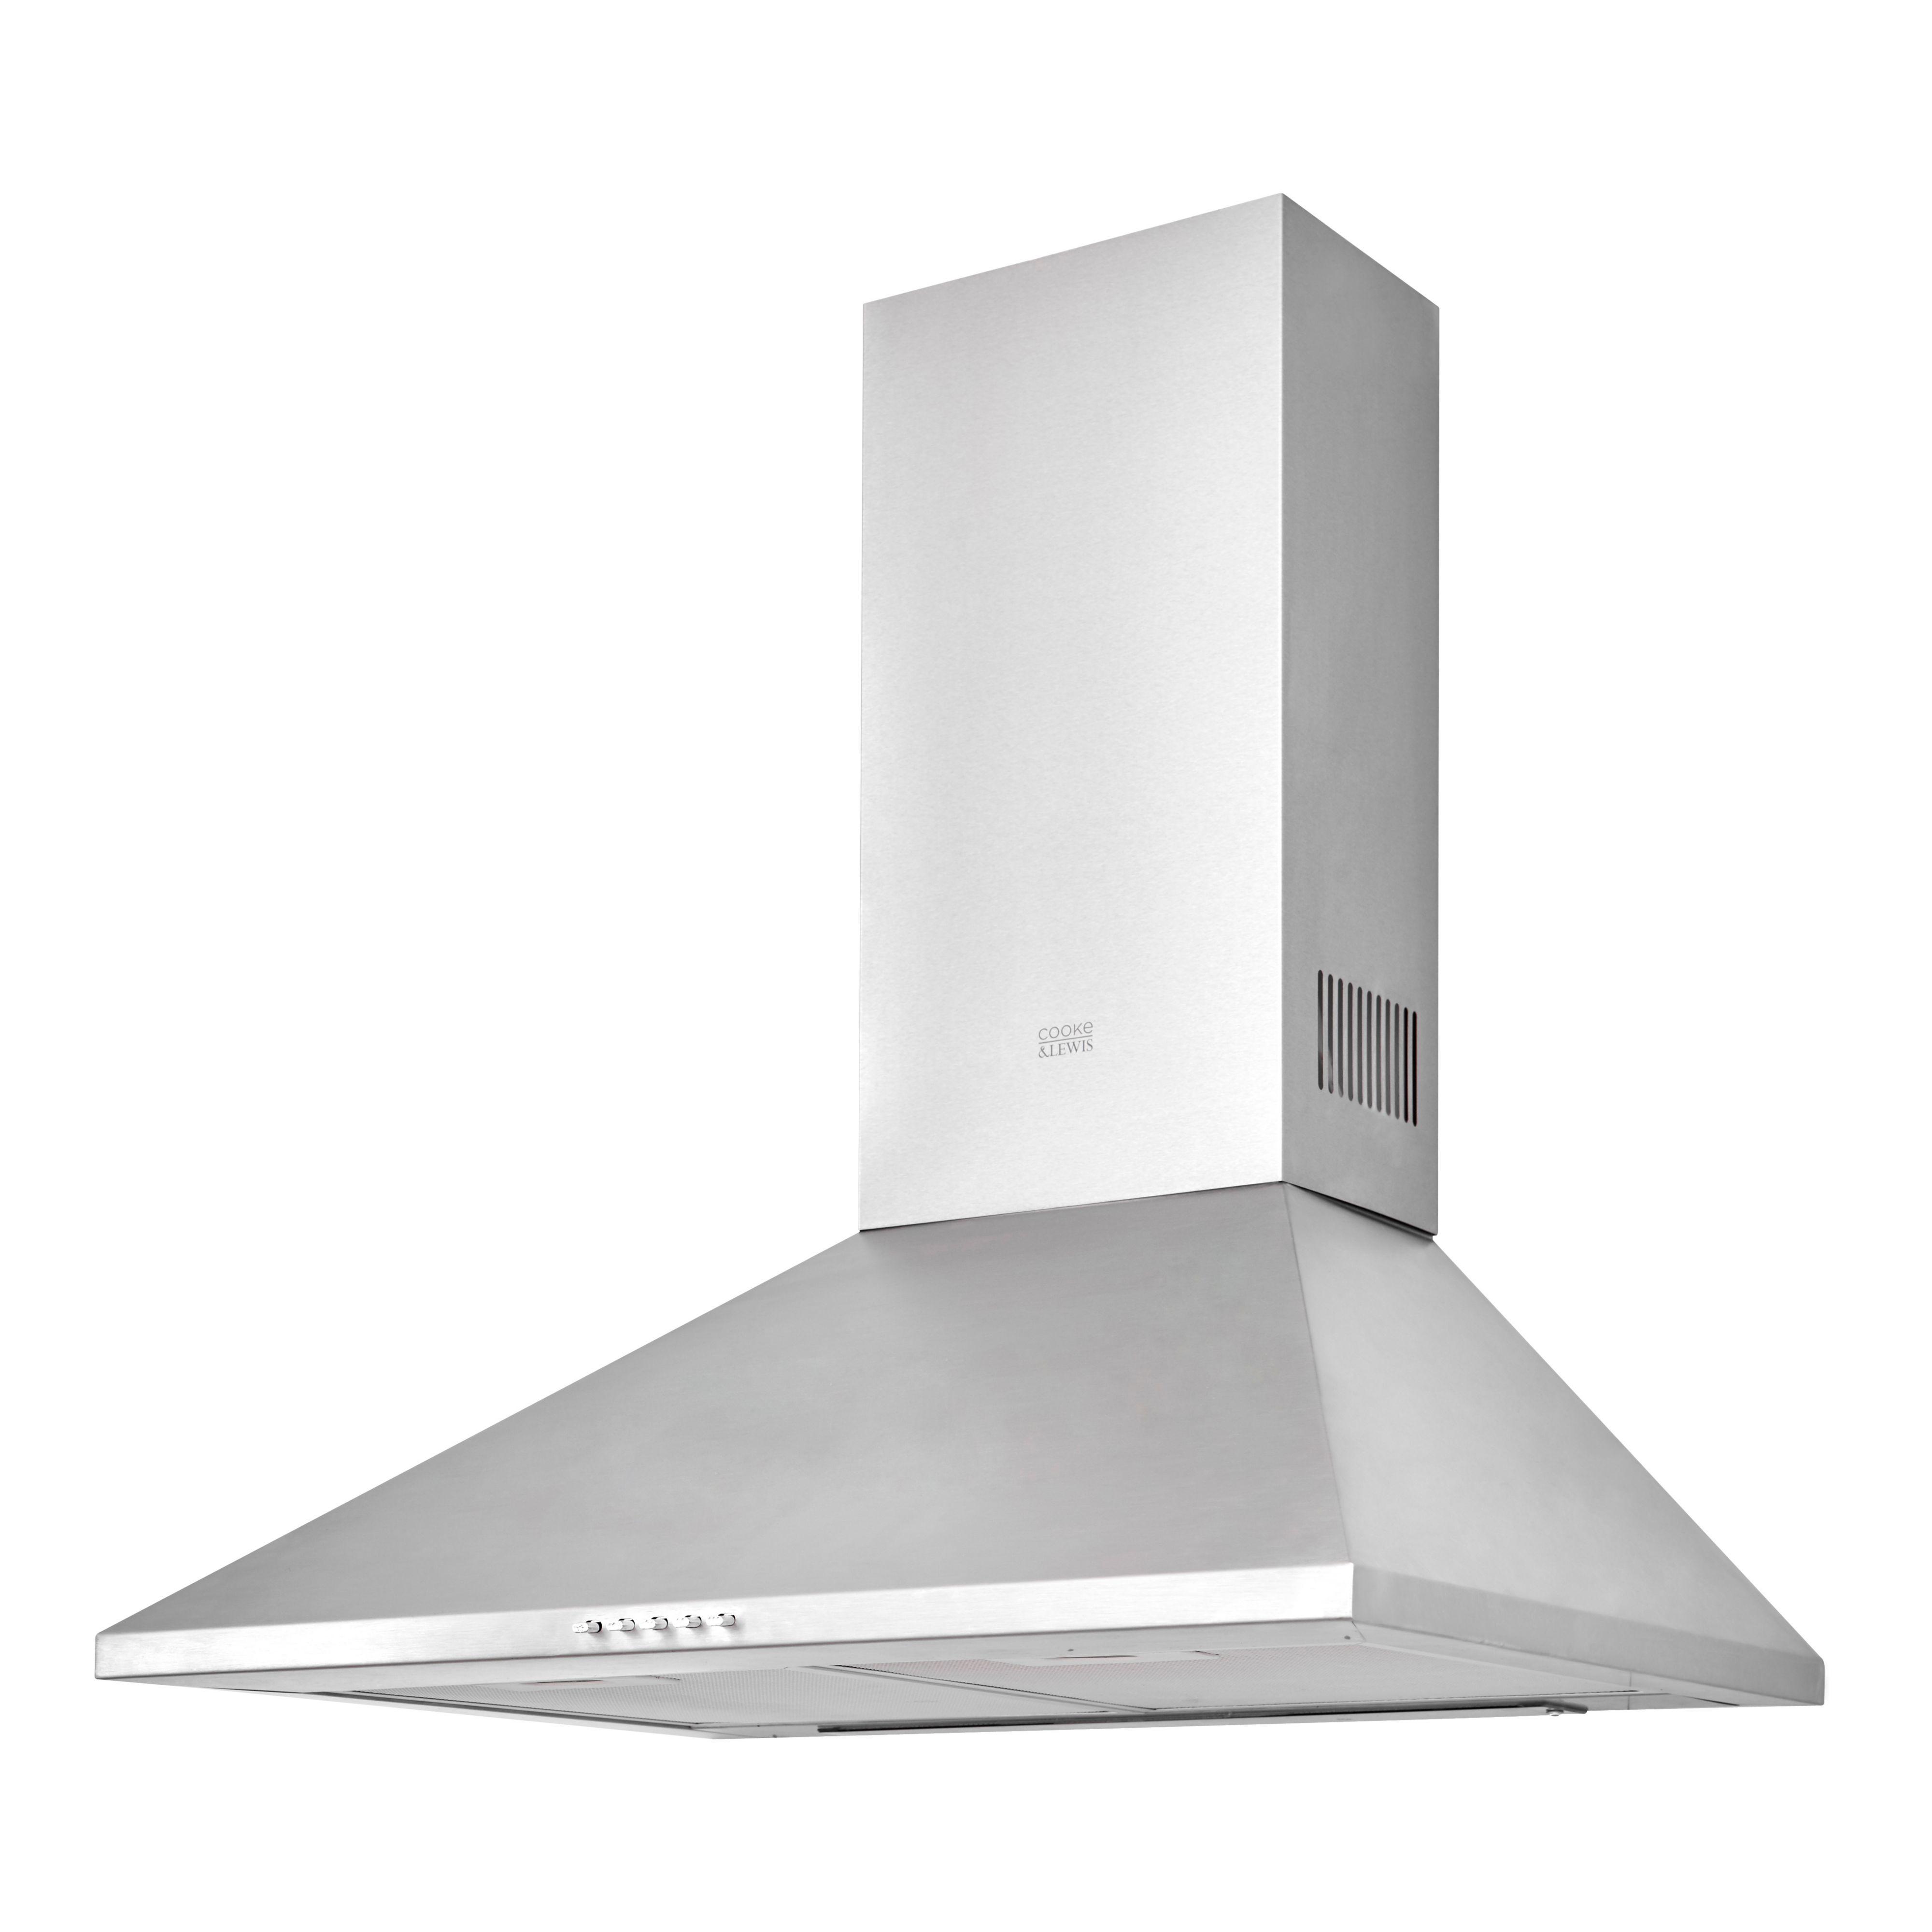 cooke lewis clchs60 inox stainless steel chimney cooker. Black Bedroom Furniture Sets. Home Design Ideas